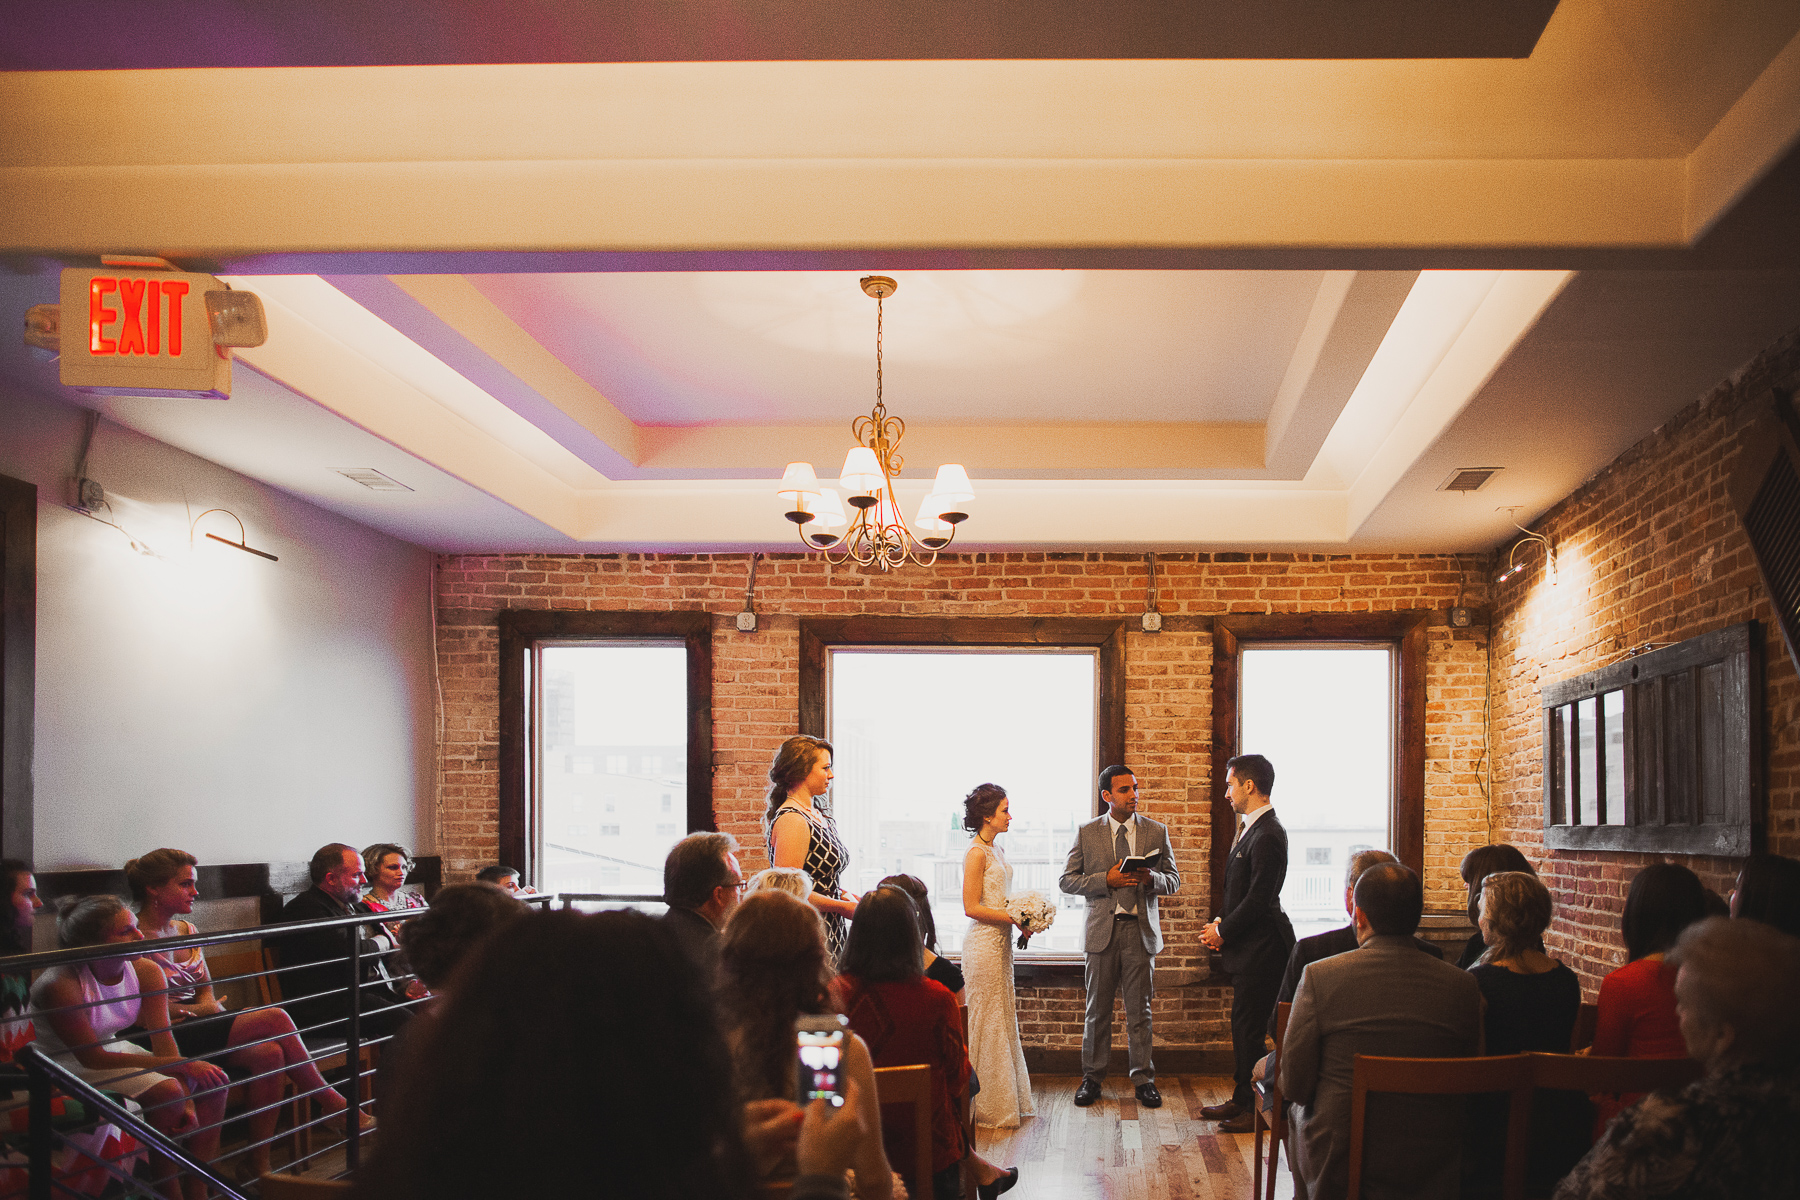 bar wedding reception in baltimore md